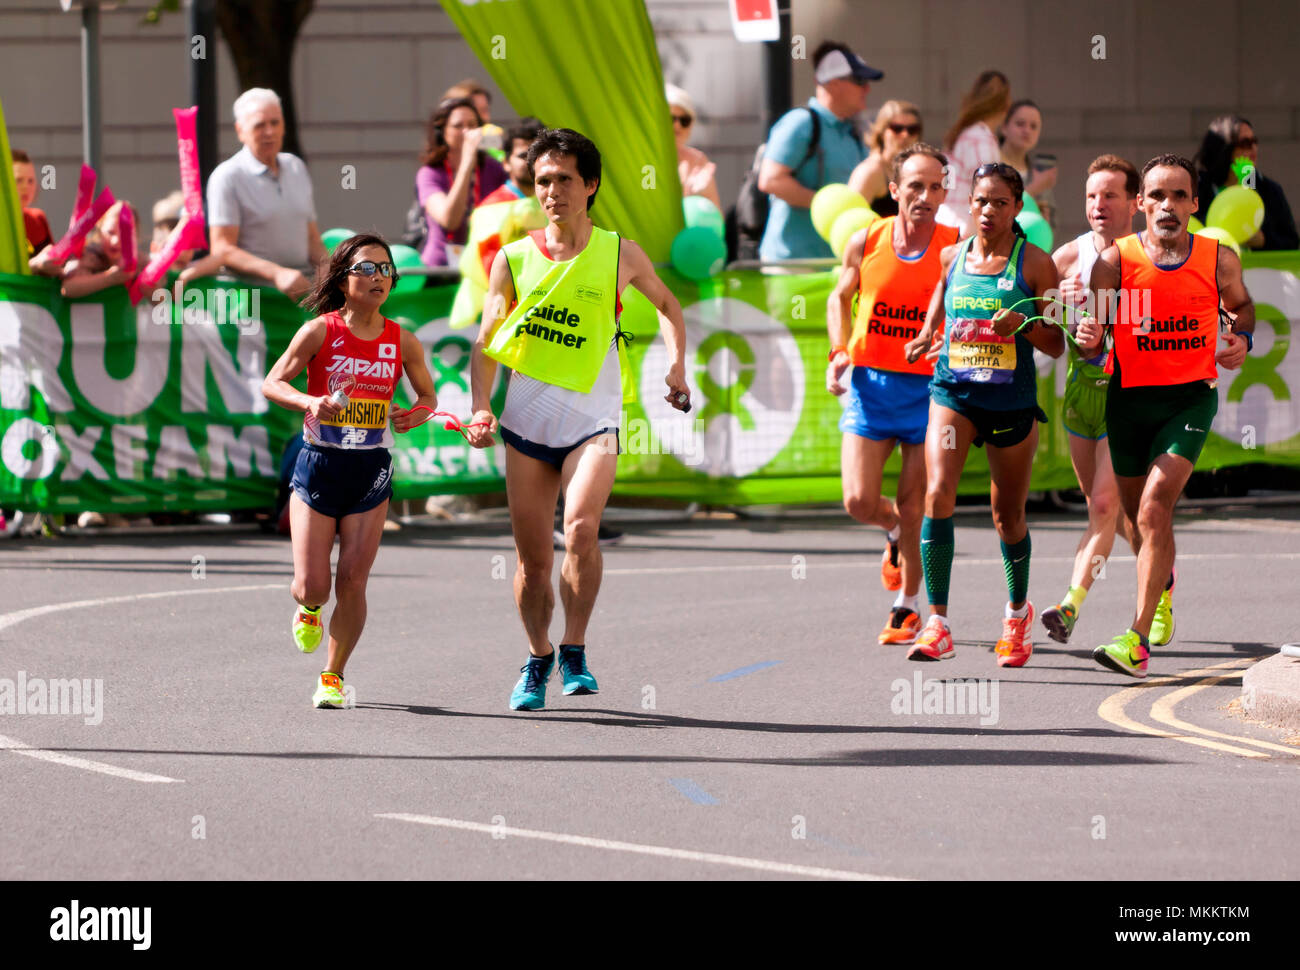 Misato Michisita (JPN)  and Edenusa  De Jesus Santos Dorta, (BRA),   competing in the World Para Athletics World Cup, Part of the 2018 London Marathon Stock Photo